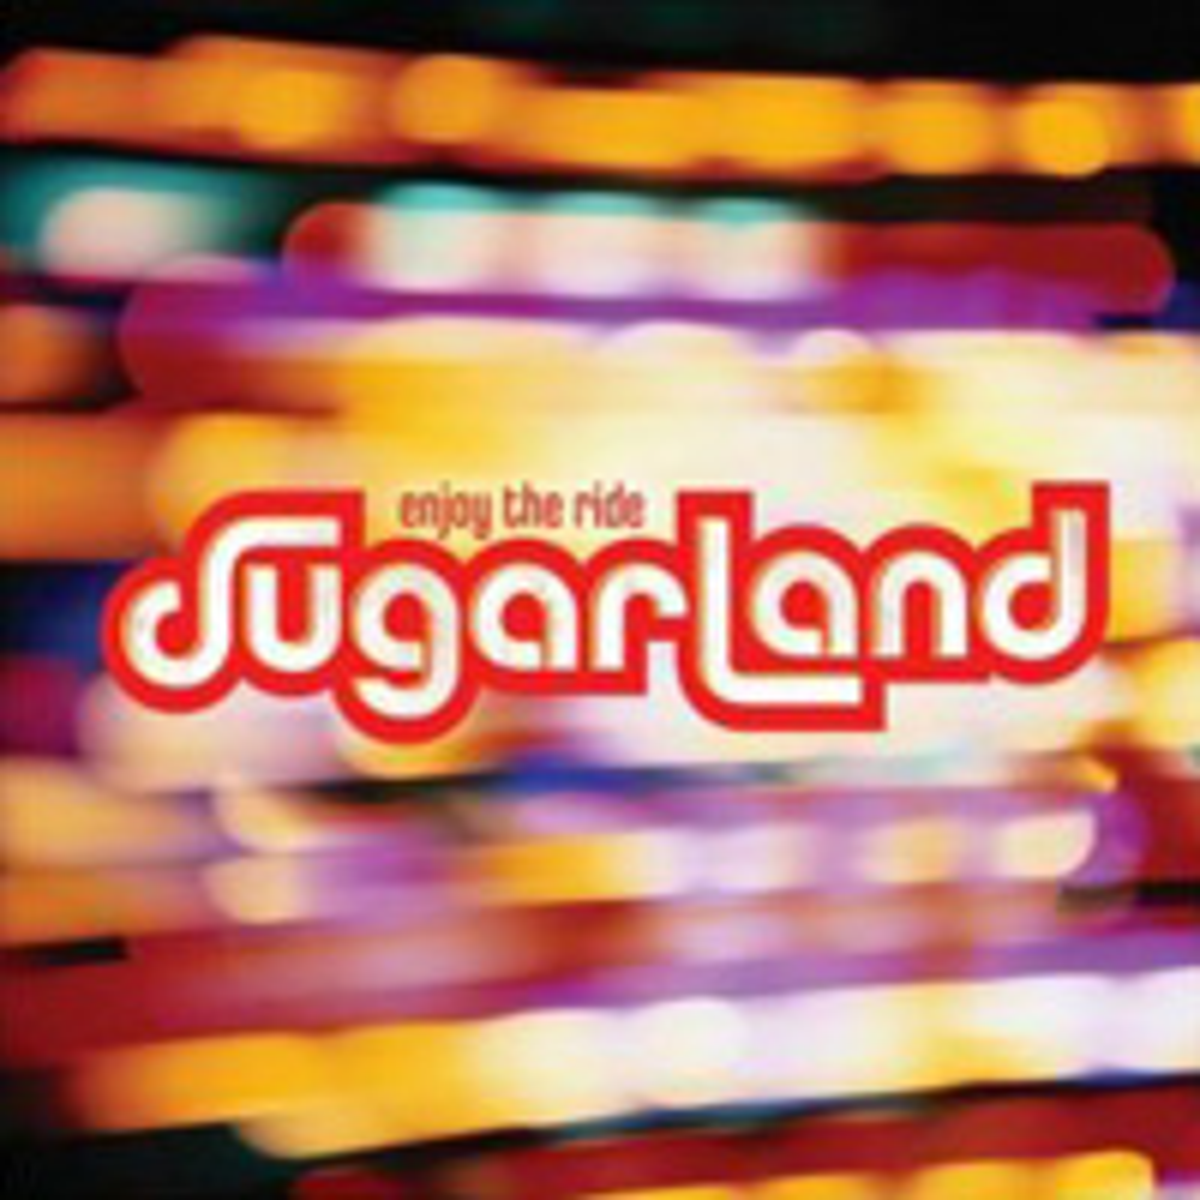 Sugarland, Enjoy the Ride